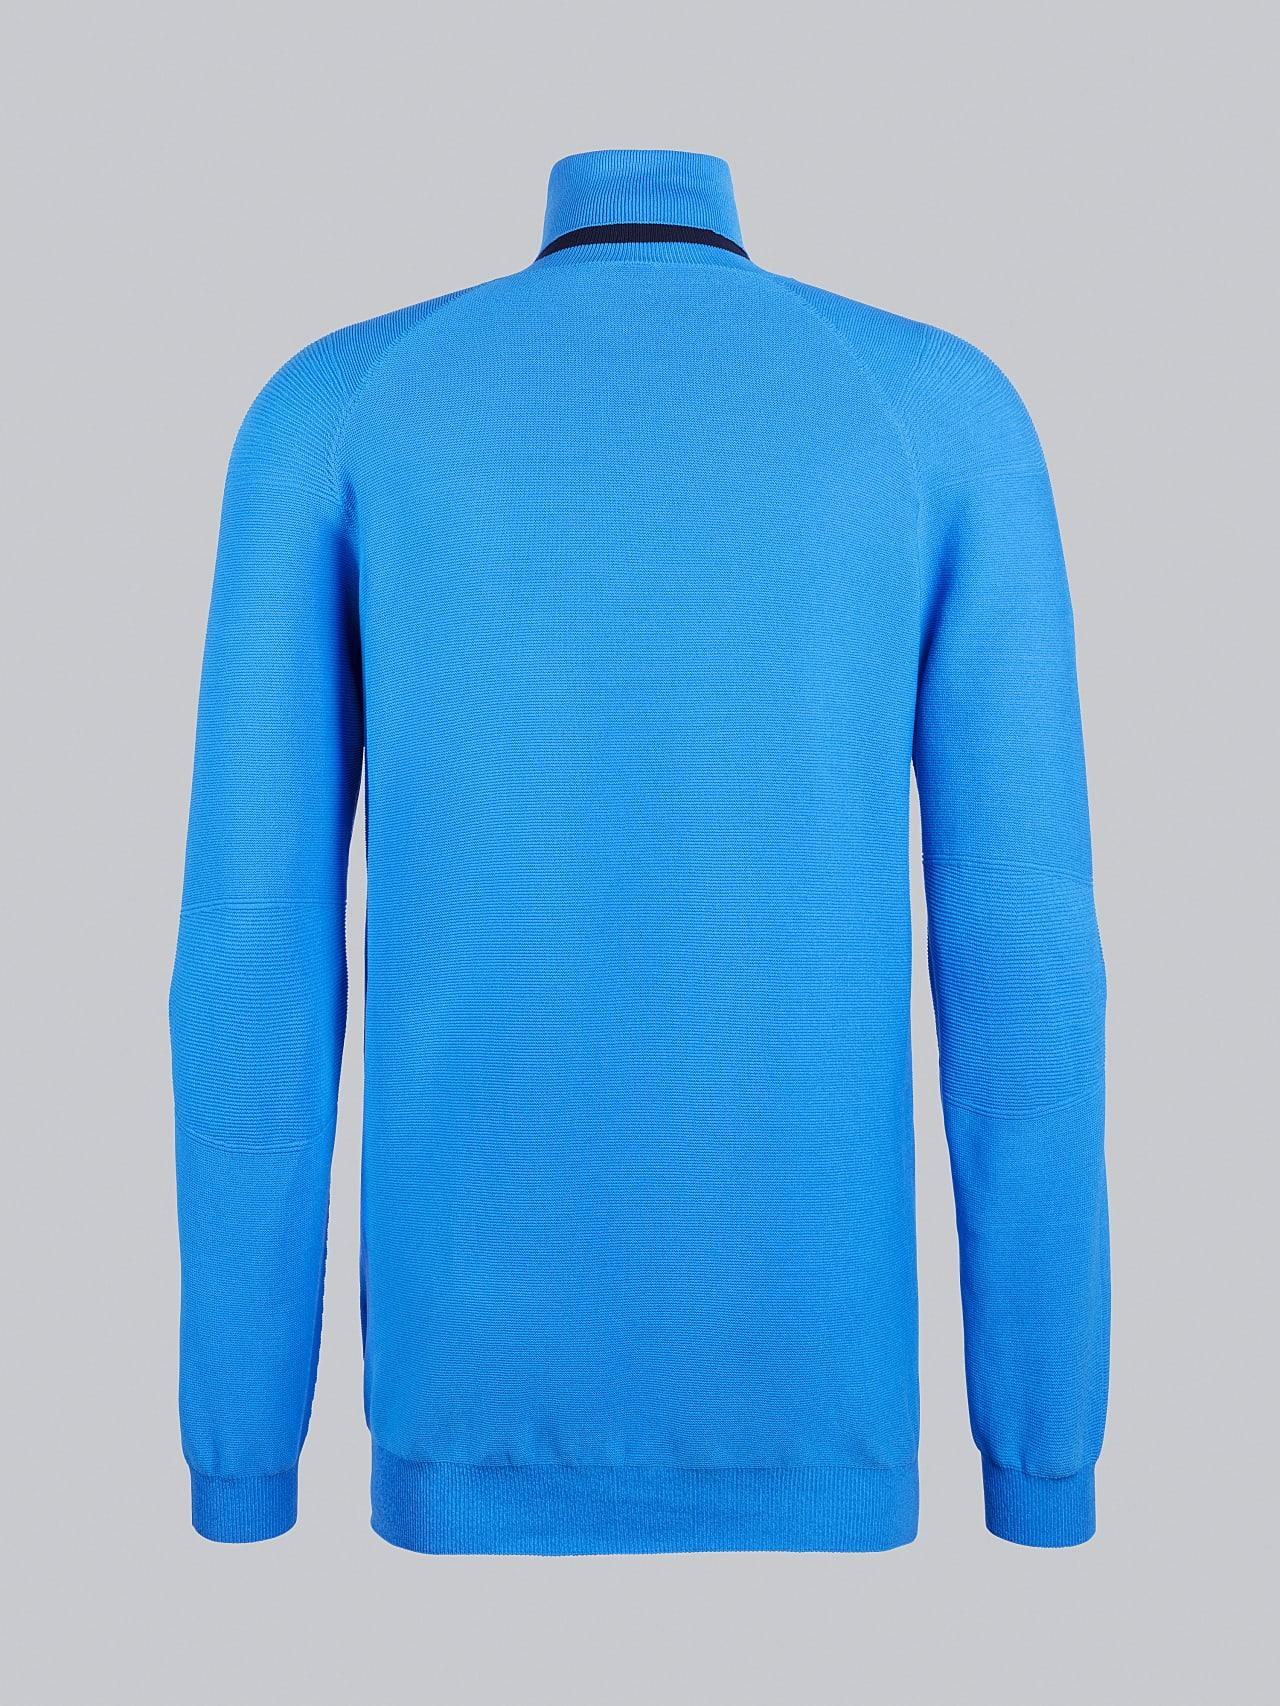 FUZZO V1.Y5.02 Seamless 3D Knit Roll-Neck Jumper blue Left Alpha Tauri